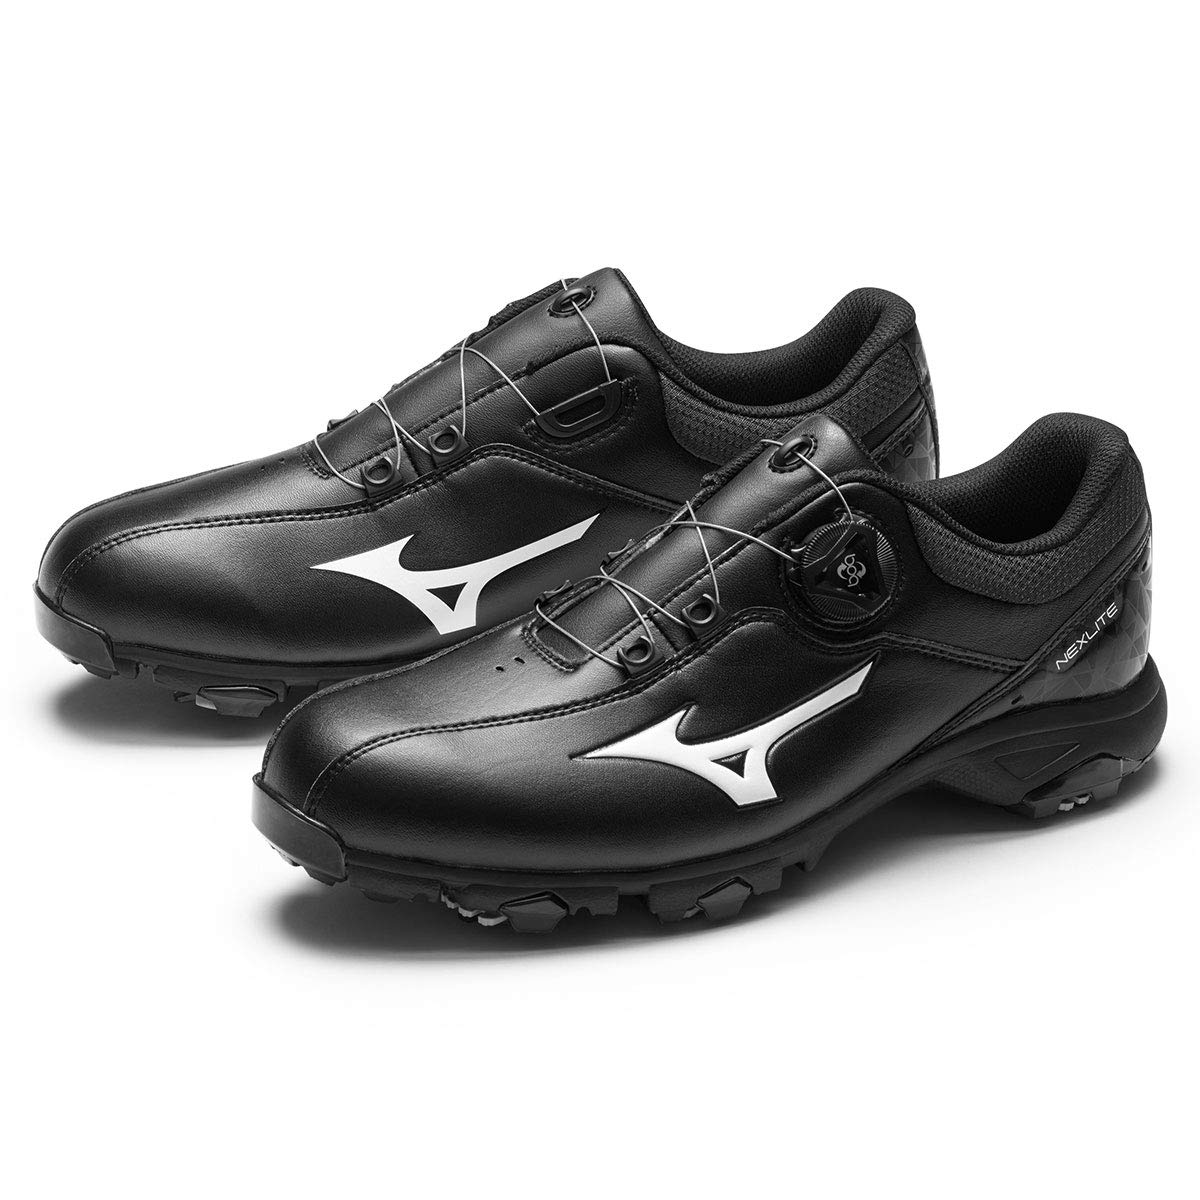 mizuno golf shoes size chart european medium leather girl